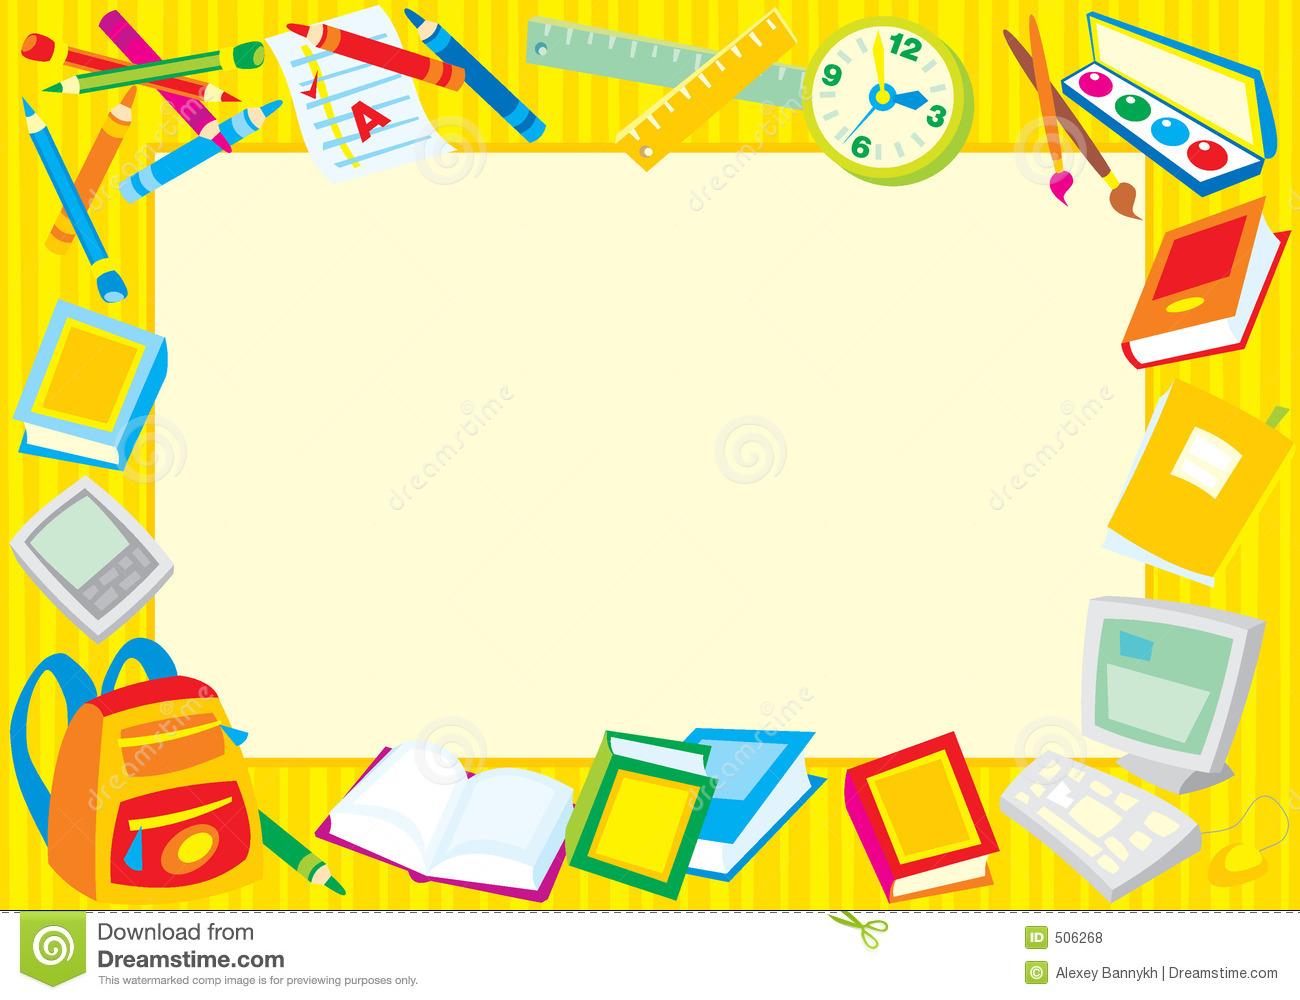 Jpeg school boarder clipart transparent download Free school border clipart - ClipartFest transparent download